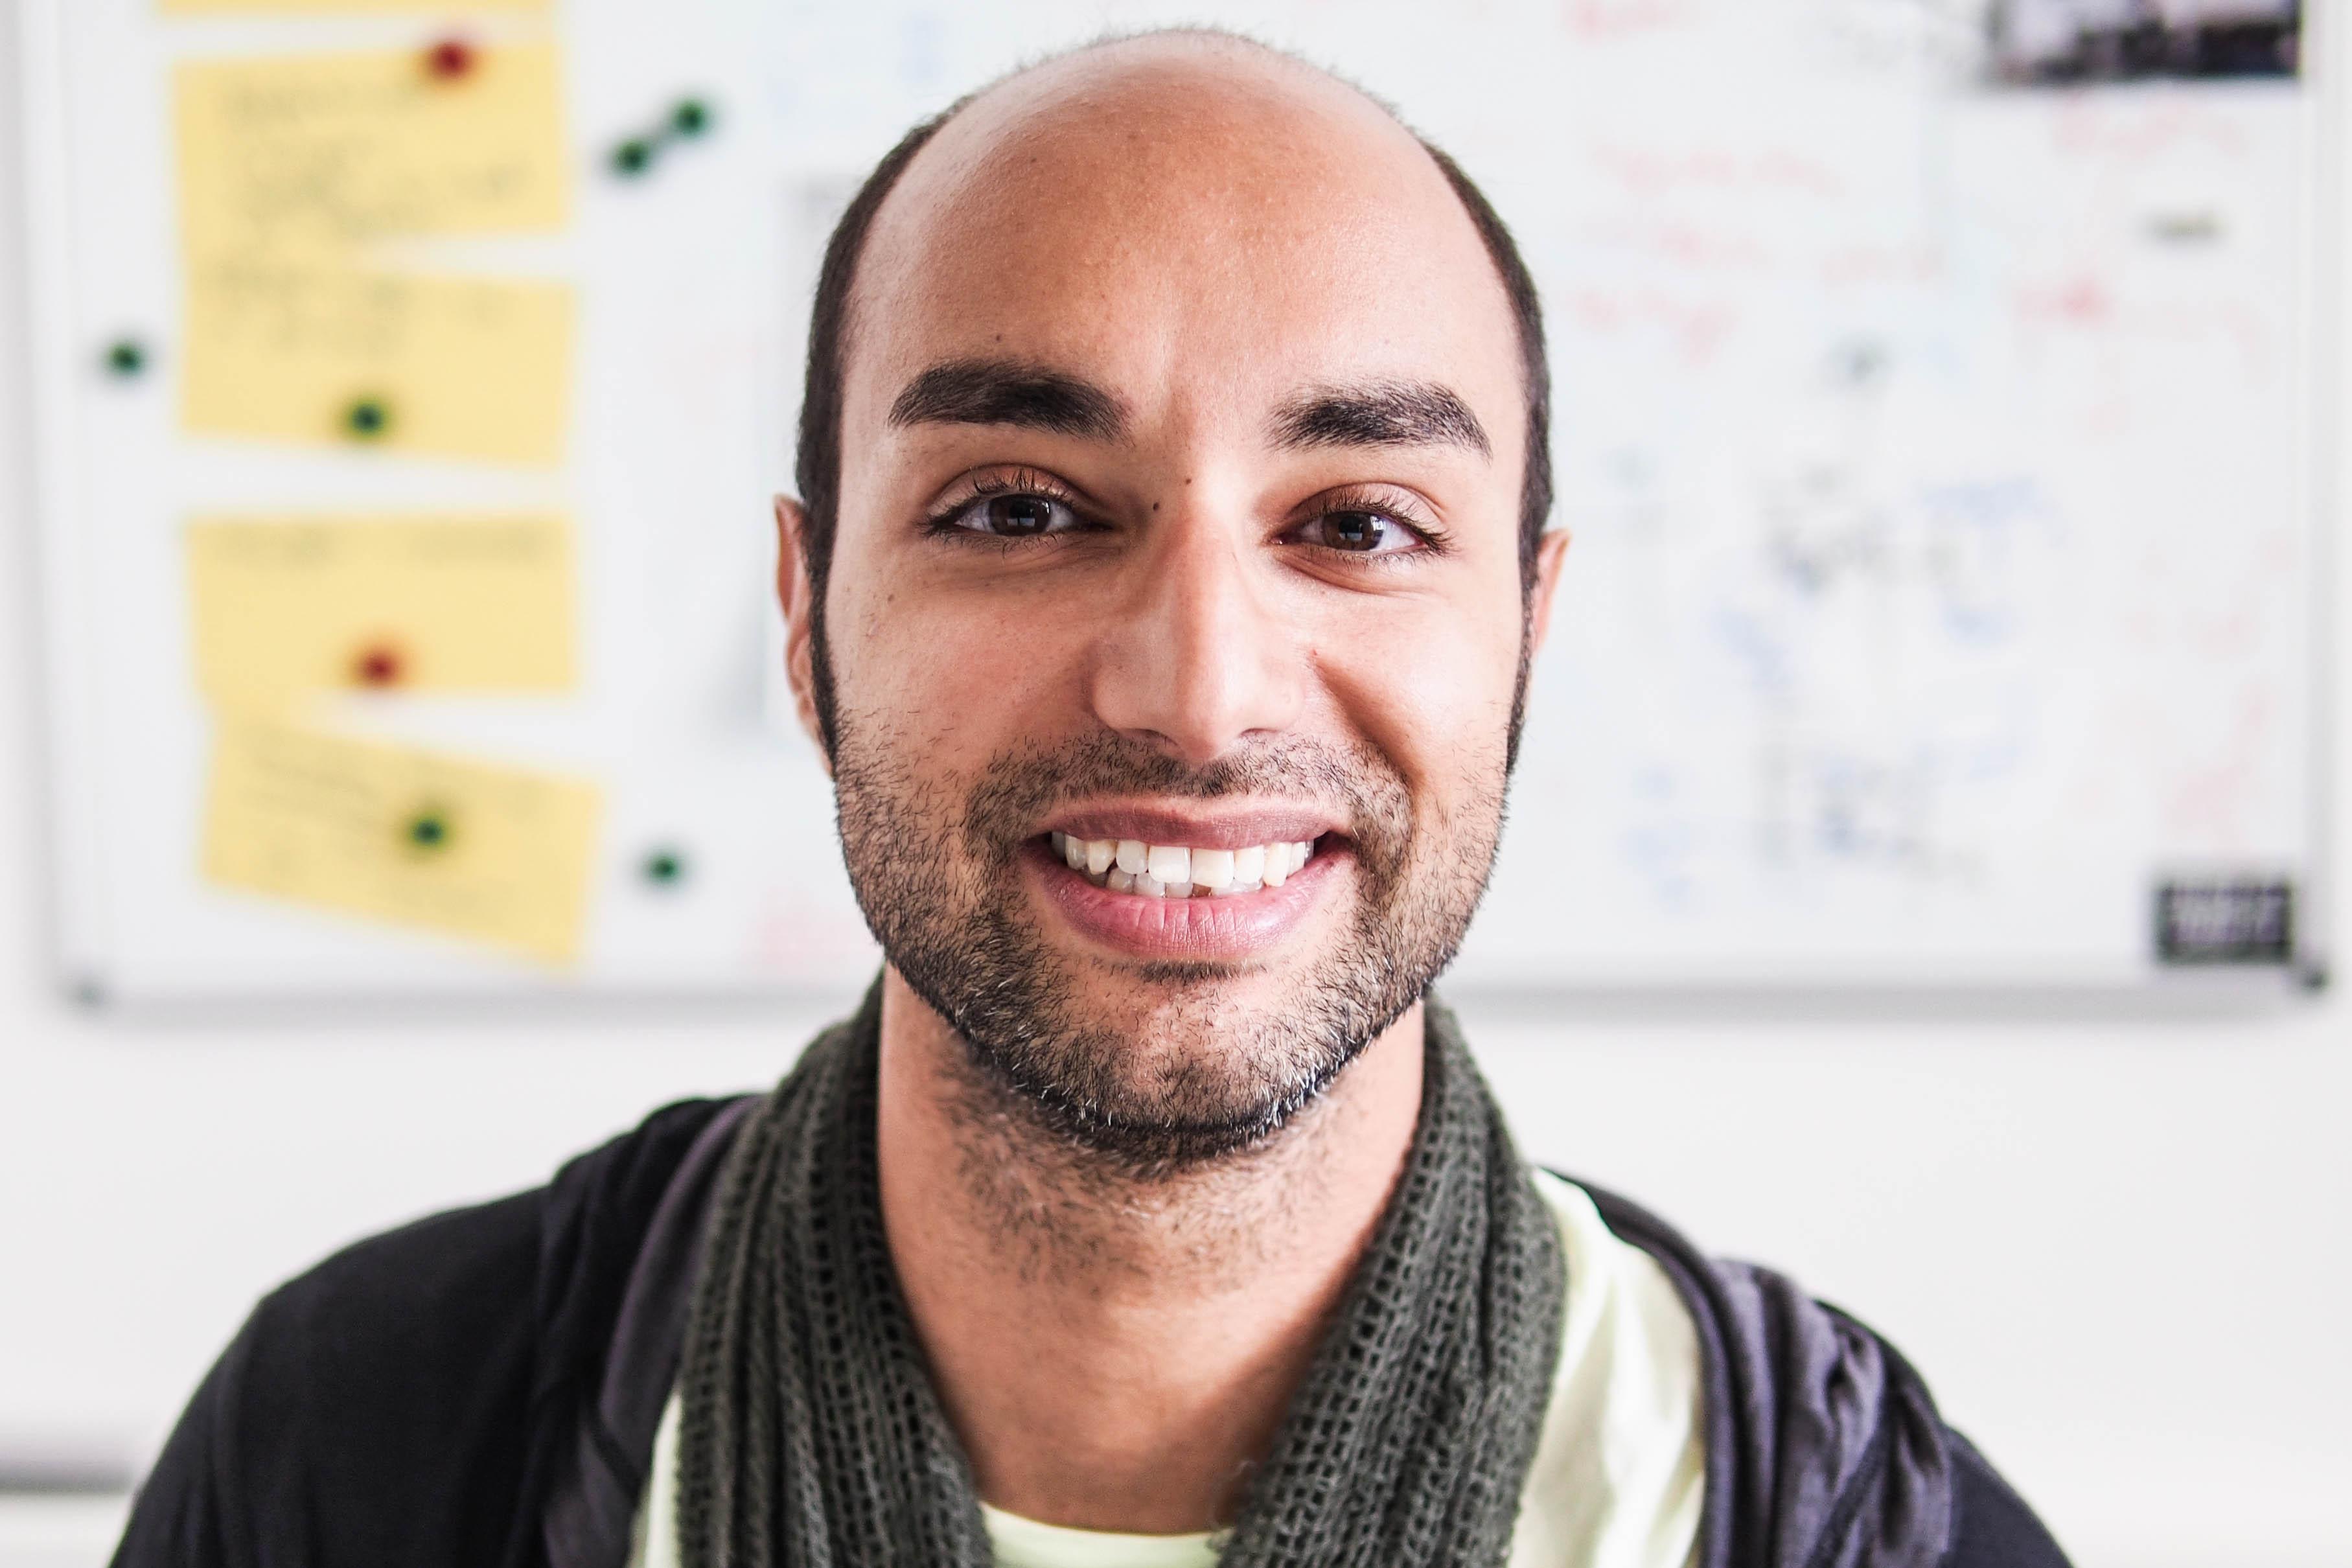 ResearchGate CEO Ijad Madisch